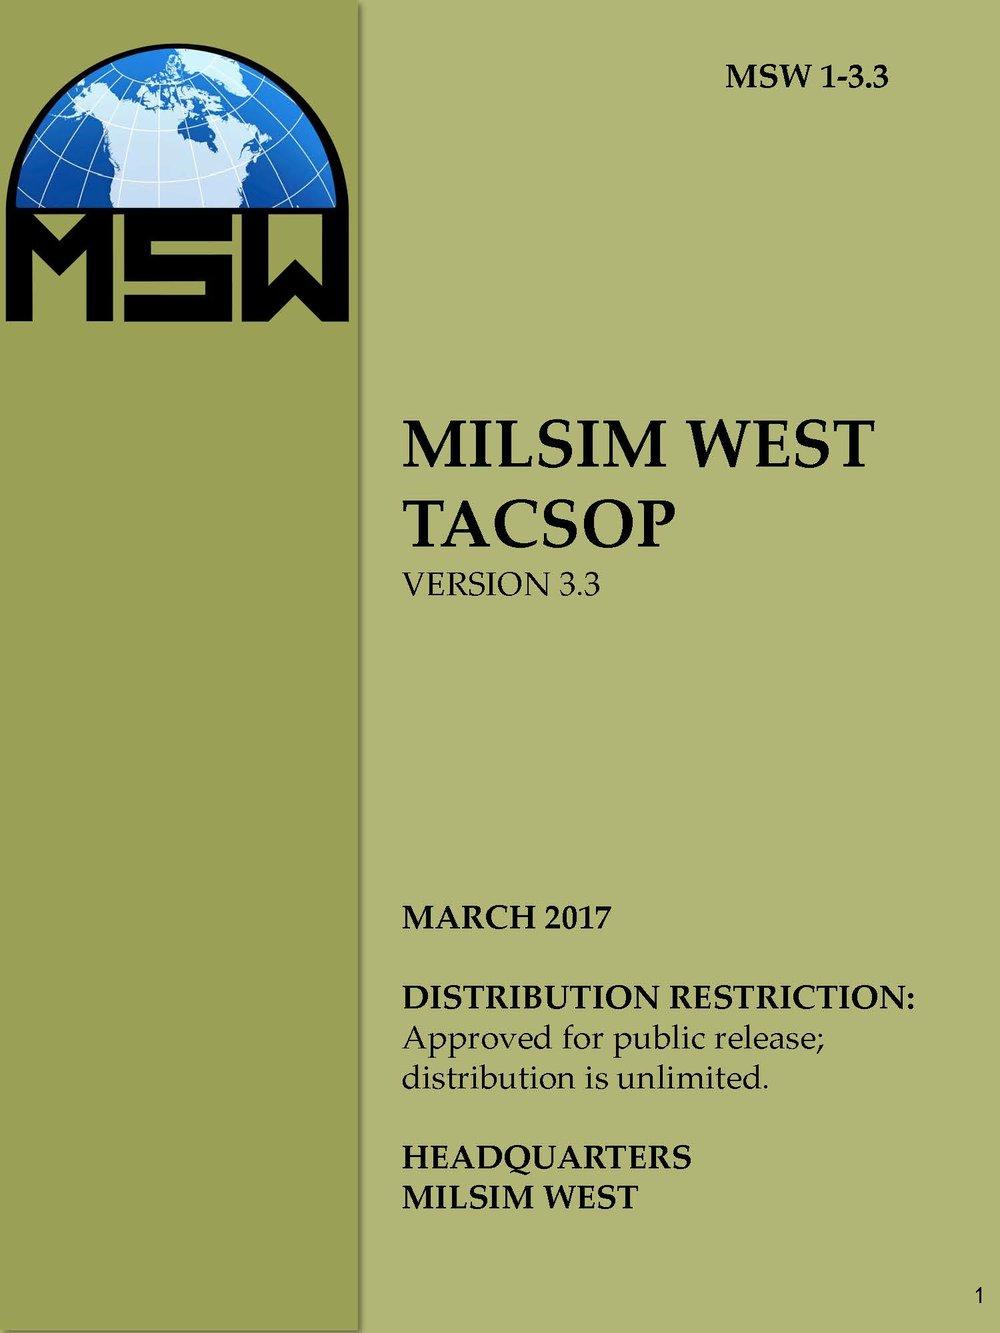 MSW_TACSOP_v.3.3_Page_01.jpg